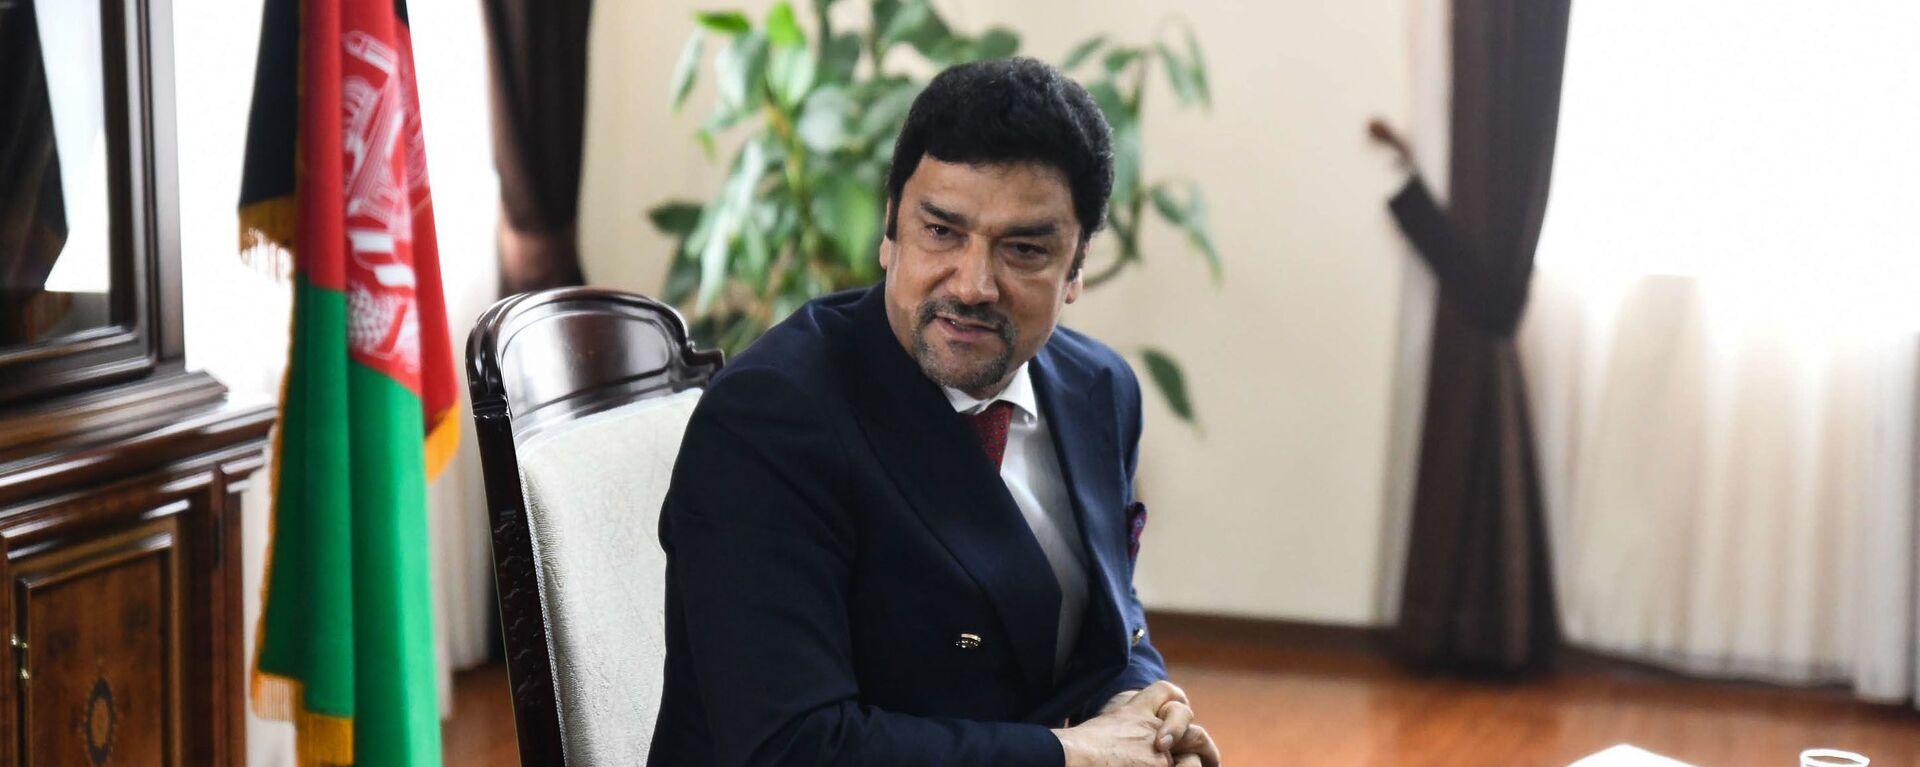 Полномочный посол Исламской Республики Афганистан Мухаммад Захир Агбар - Sputnik Таджикистан, 1920, 07.09.2021